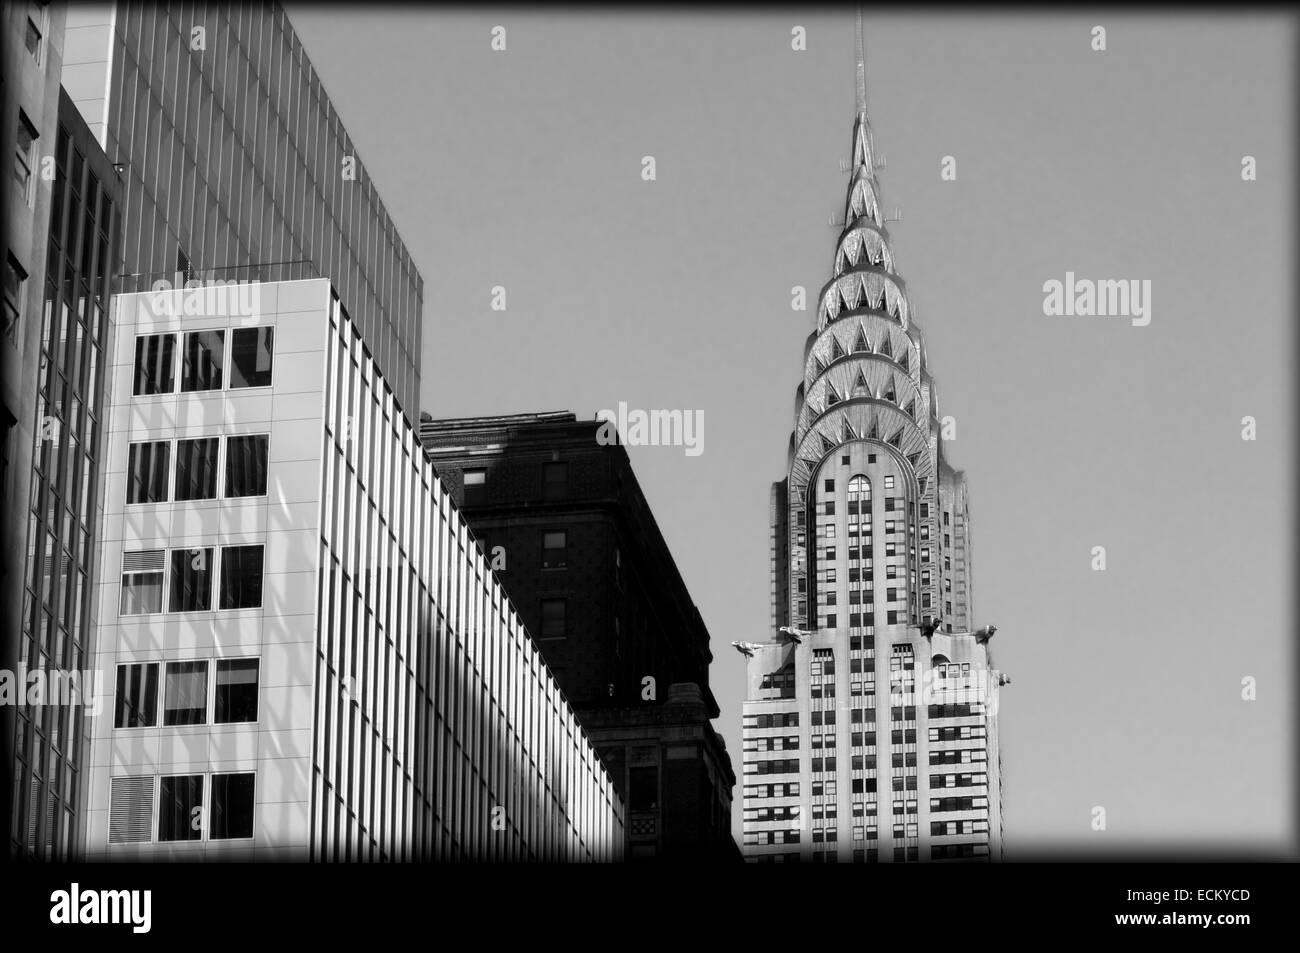 United States, New York City, Manhattan, Chrysler Building - Stock Image